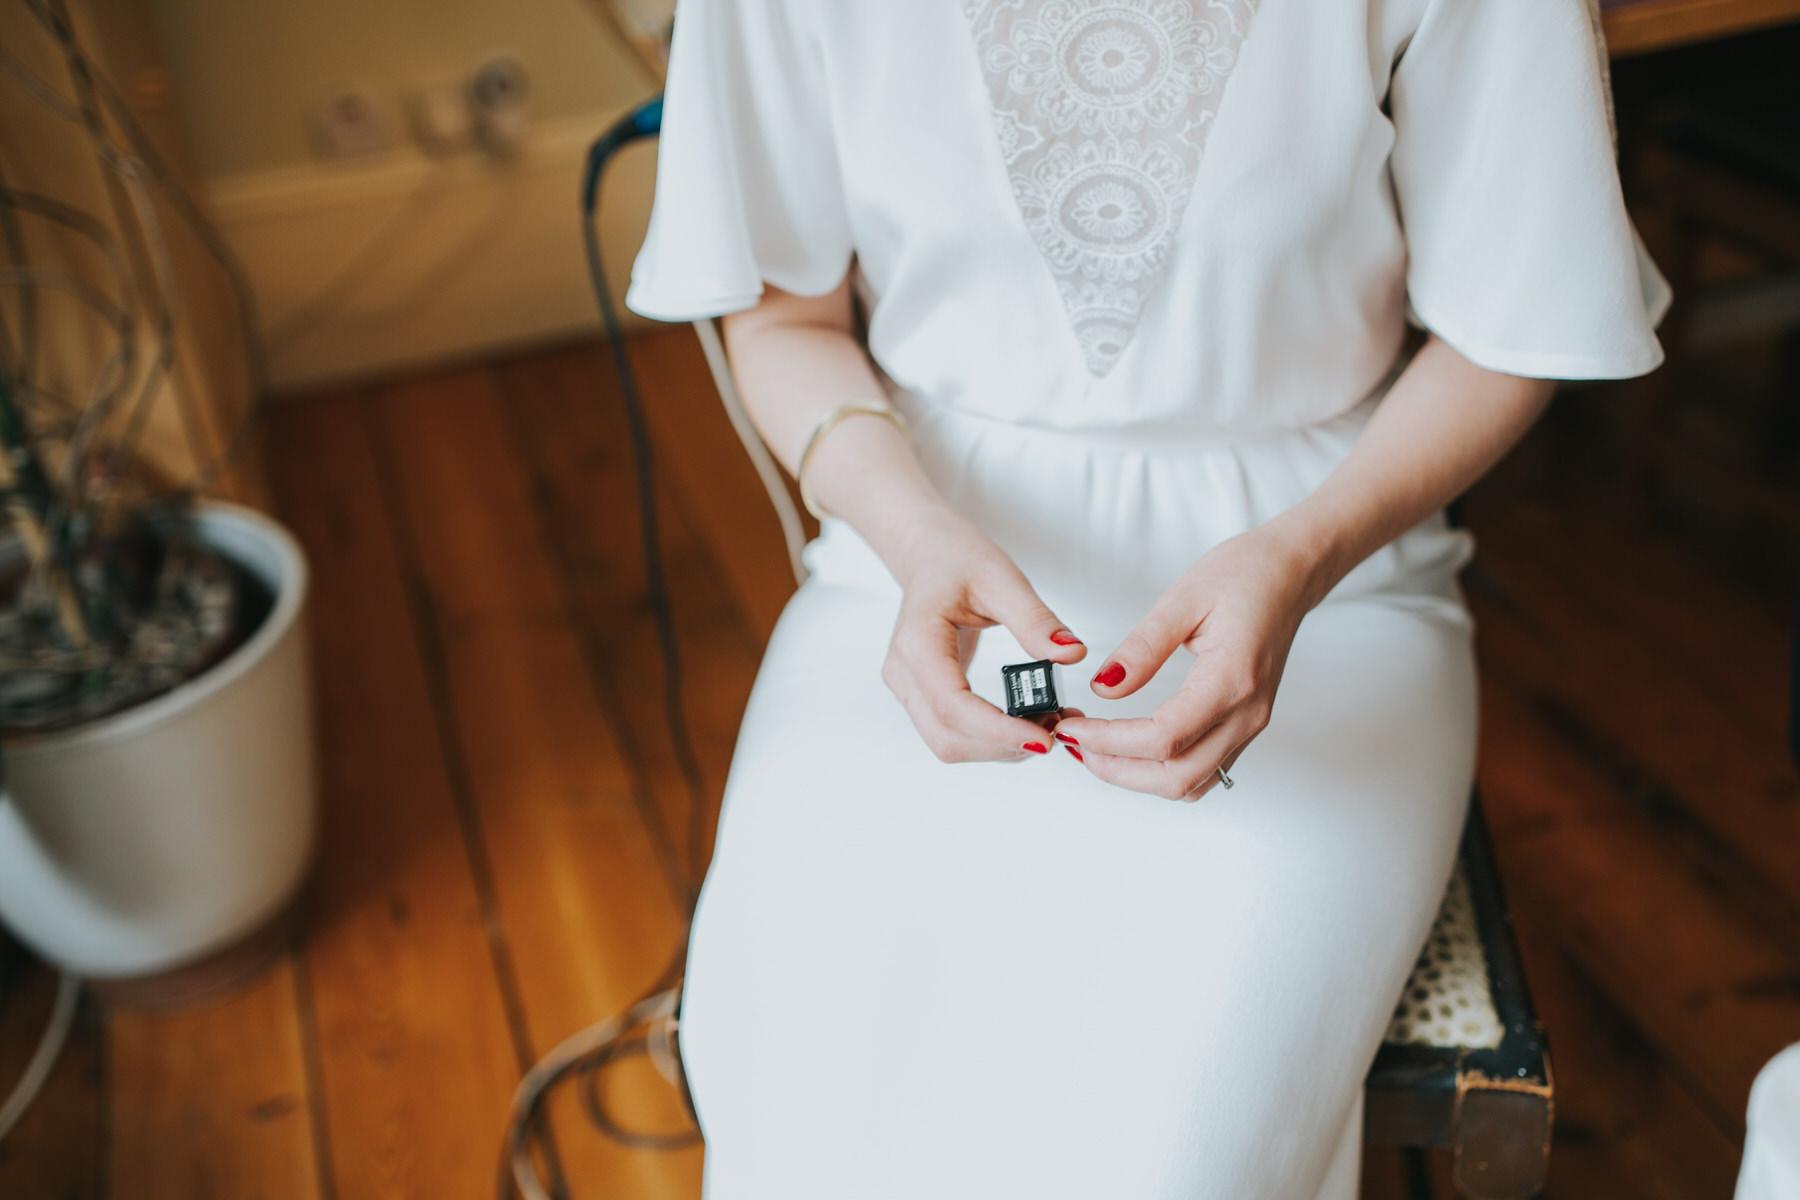 43-bride holding lipstick getting ready Minna wedding dress.jpg